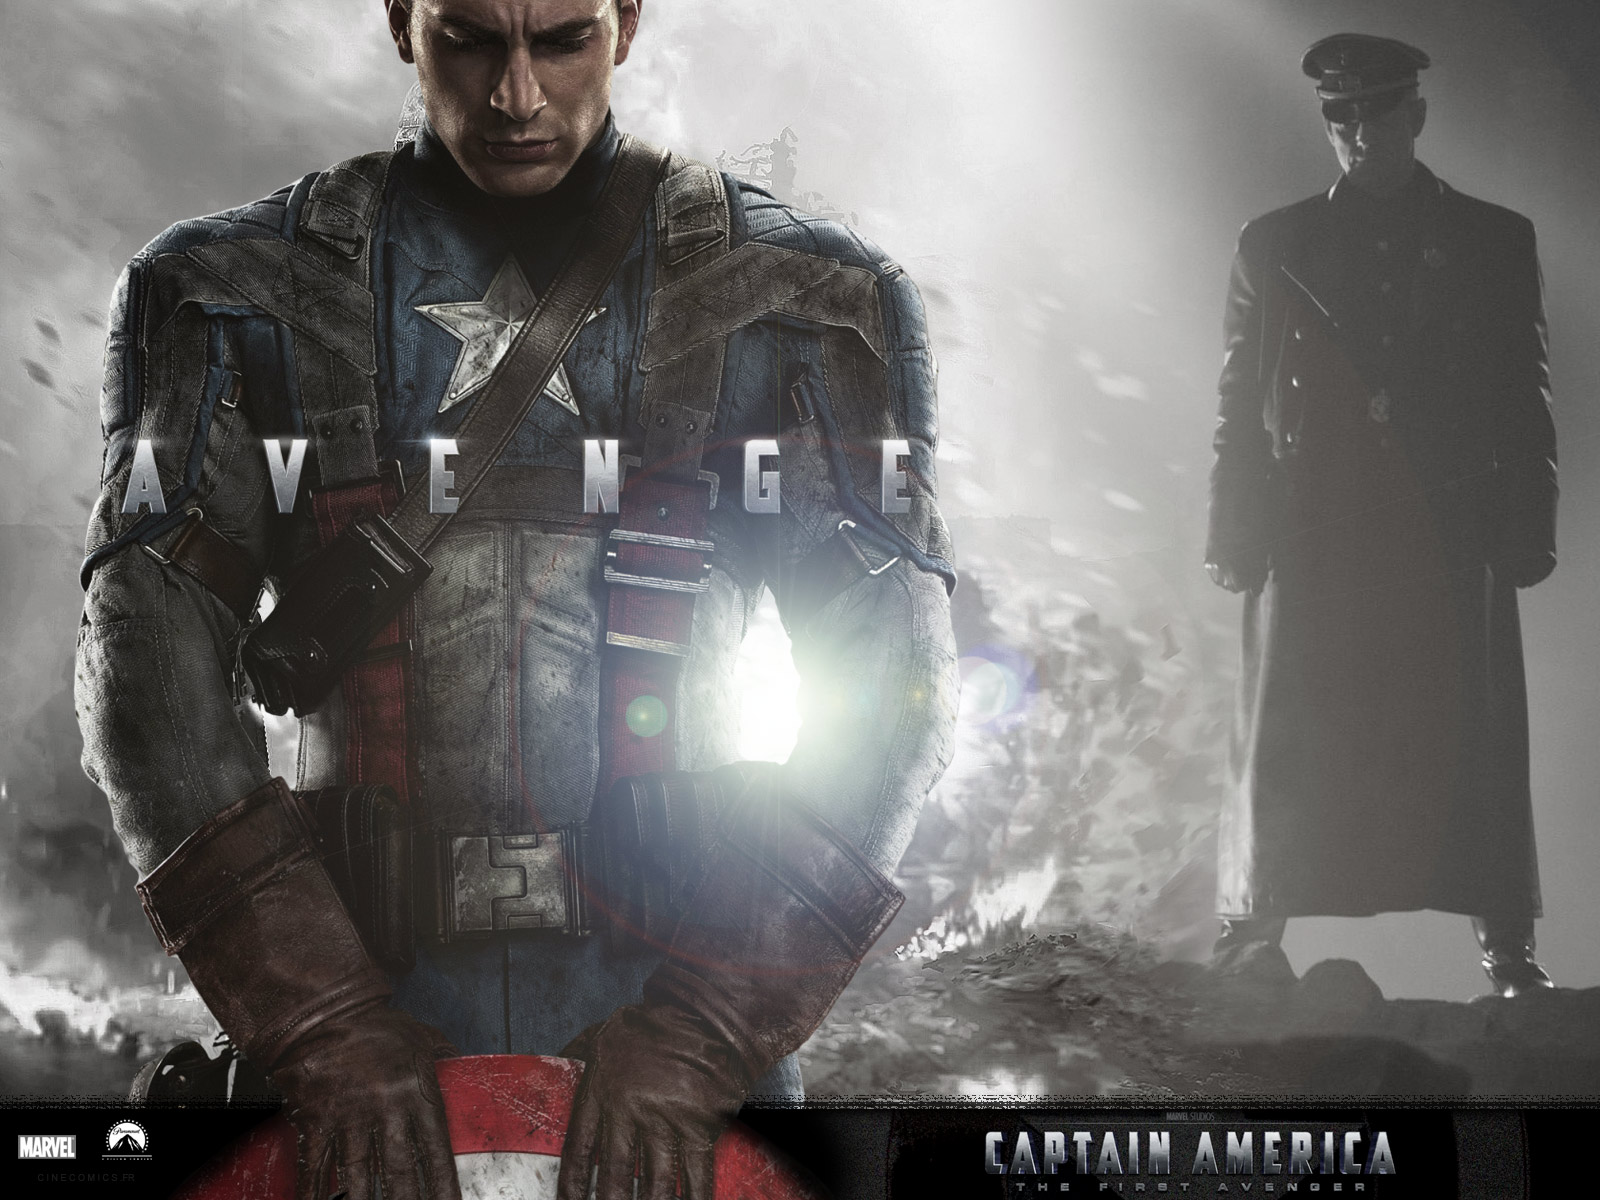 http://4.bp.blogspot.com/-gmPMw_1OG9U/Tj3uTSXzokI/AAAAAAAAC5U/zrM30DLLkuQ/s1600/captain_america_movie-normal.jpg